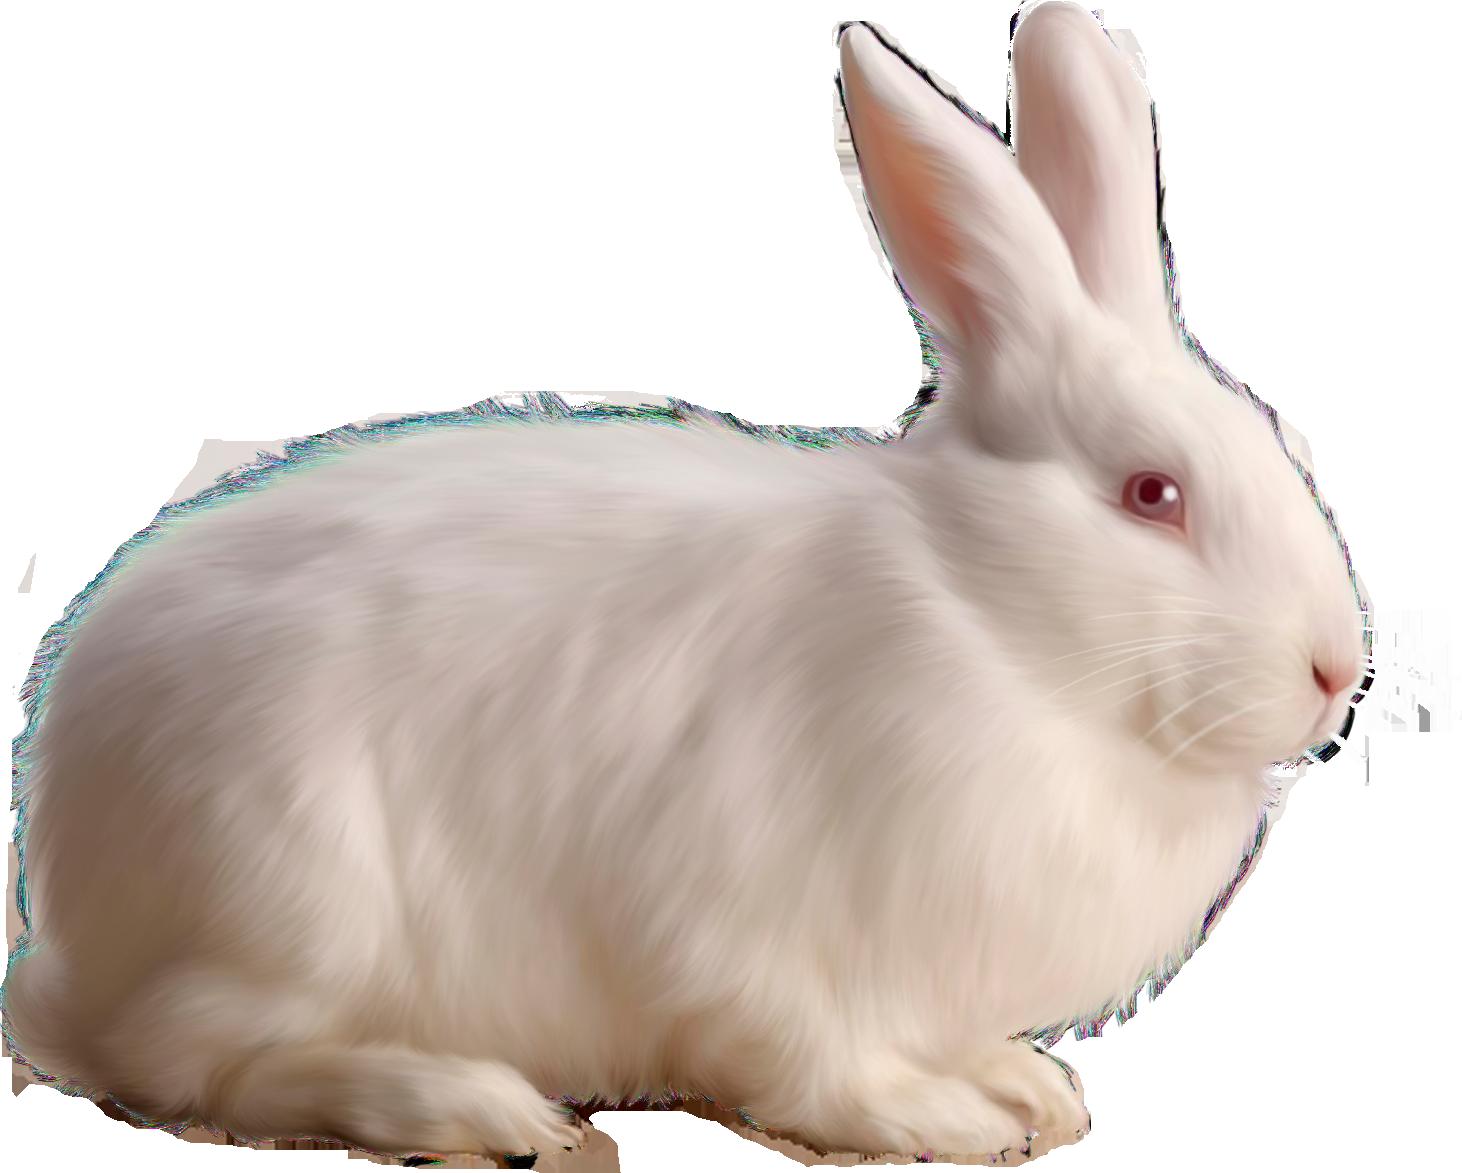 Rabbit-Free-PNG-Image.png (1462×1173) - Rabbit PNG